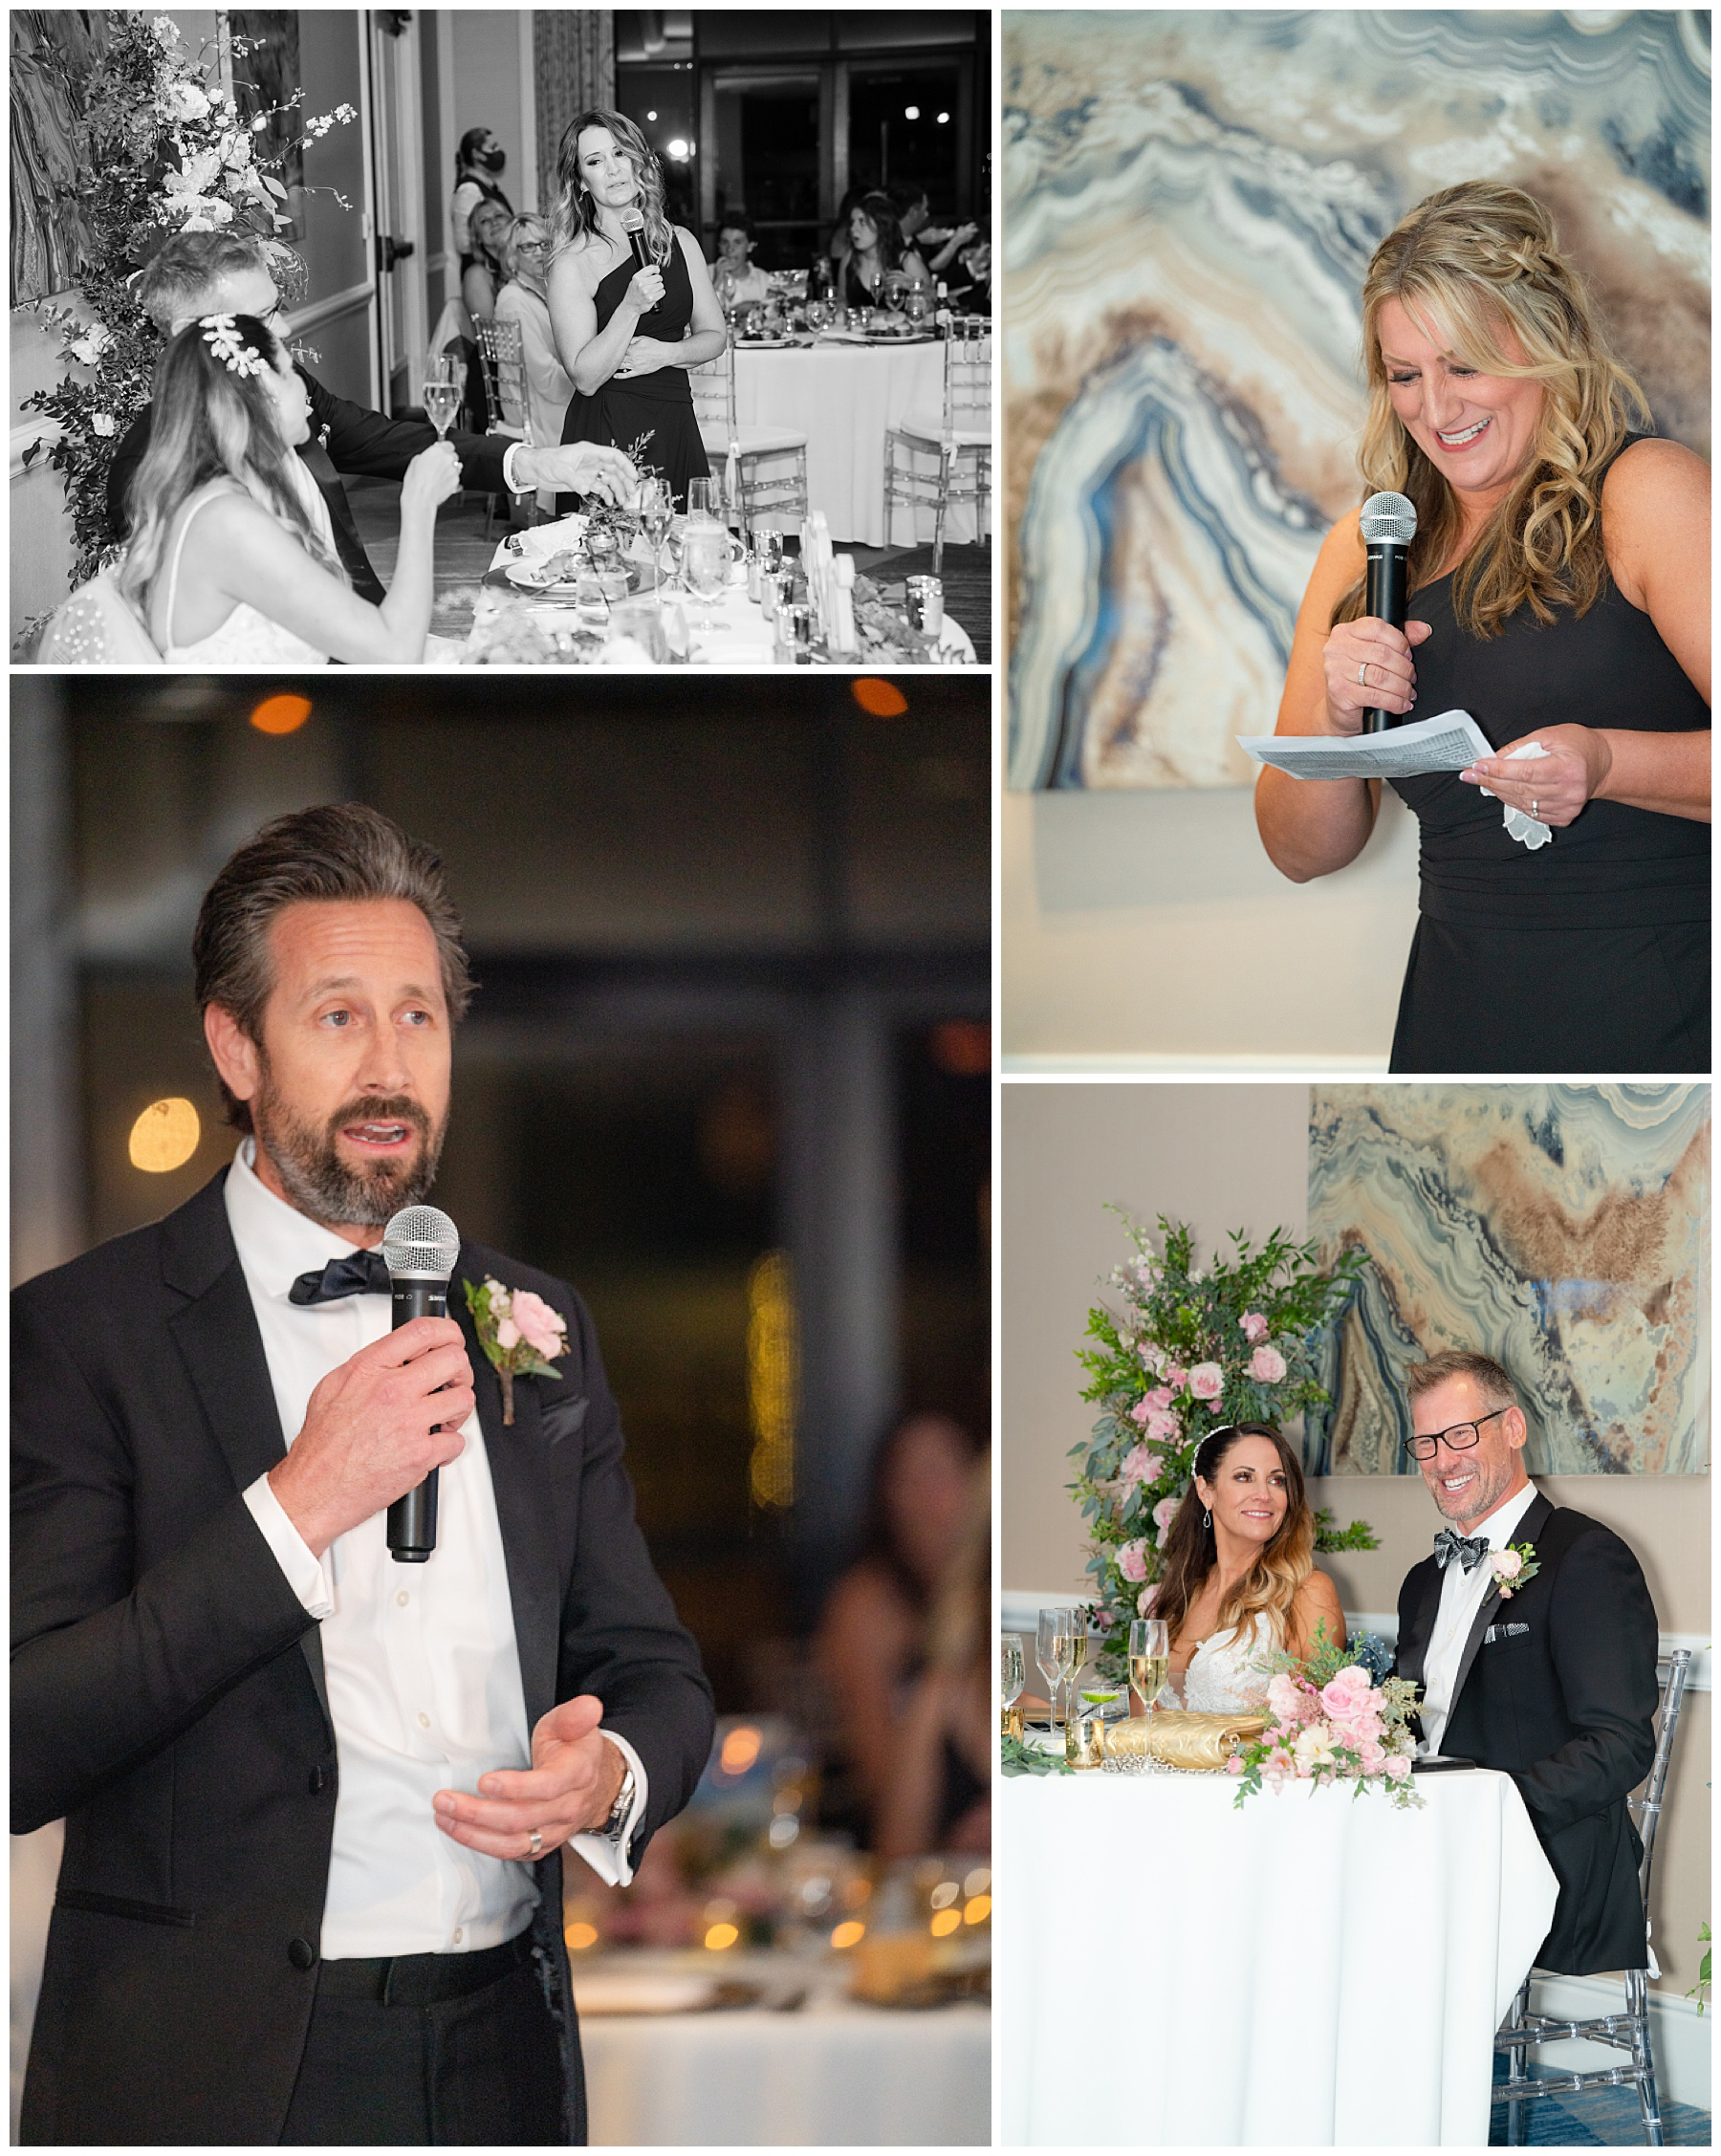 hilton wedding toasts